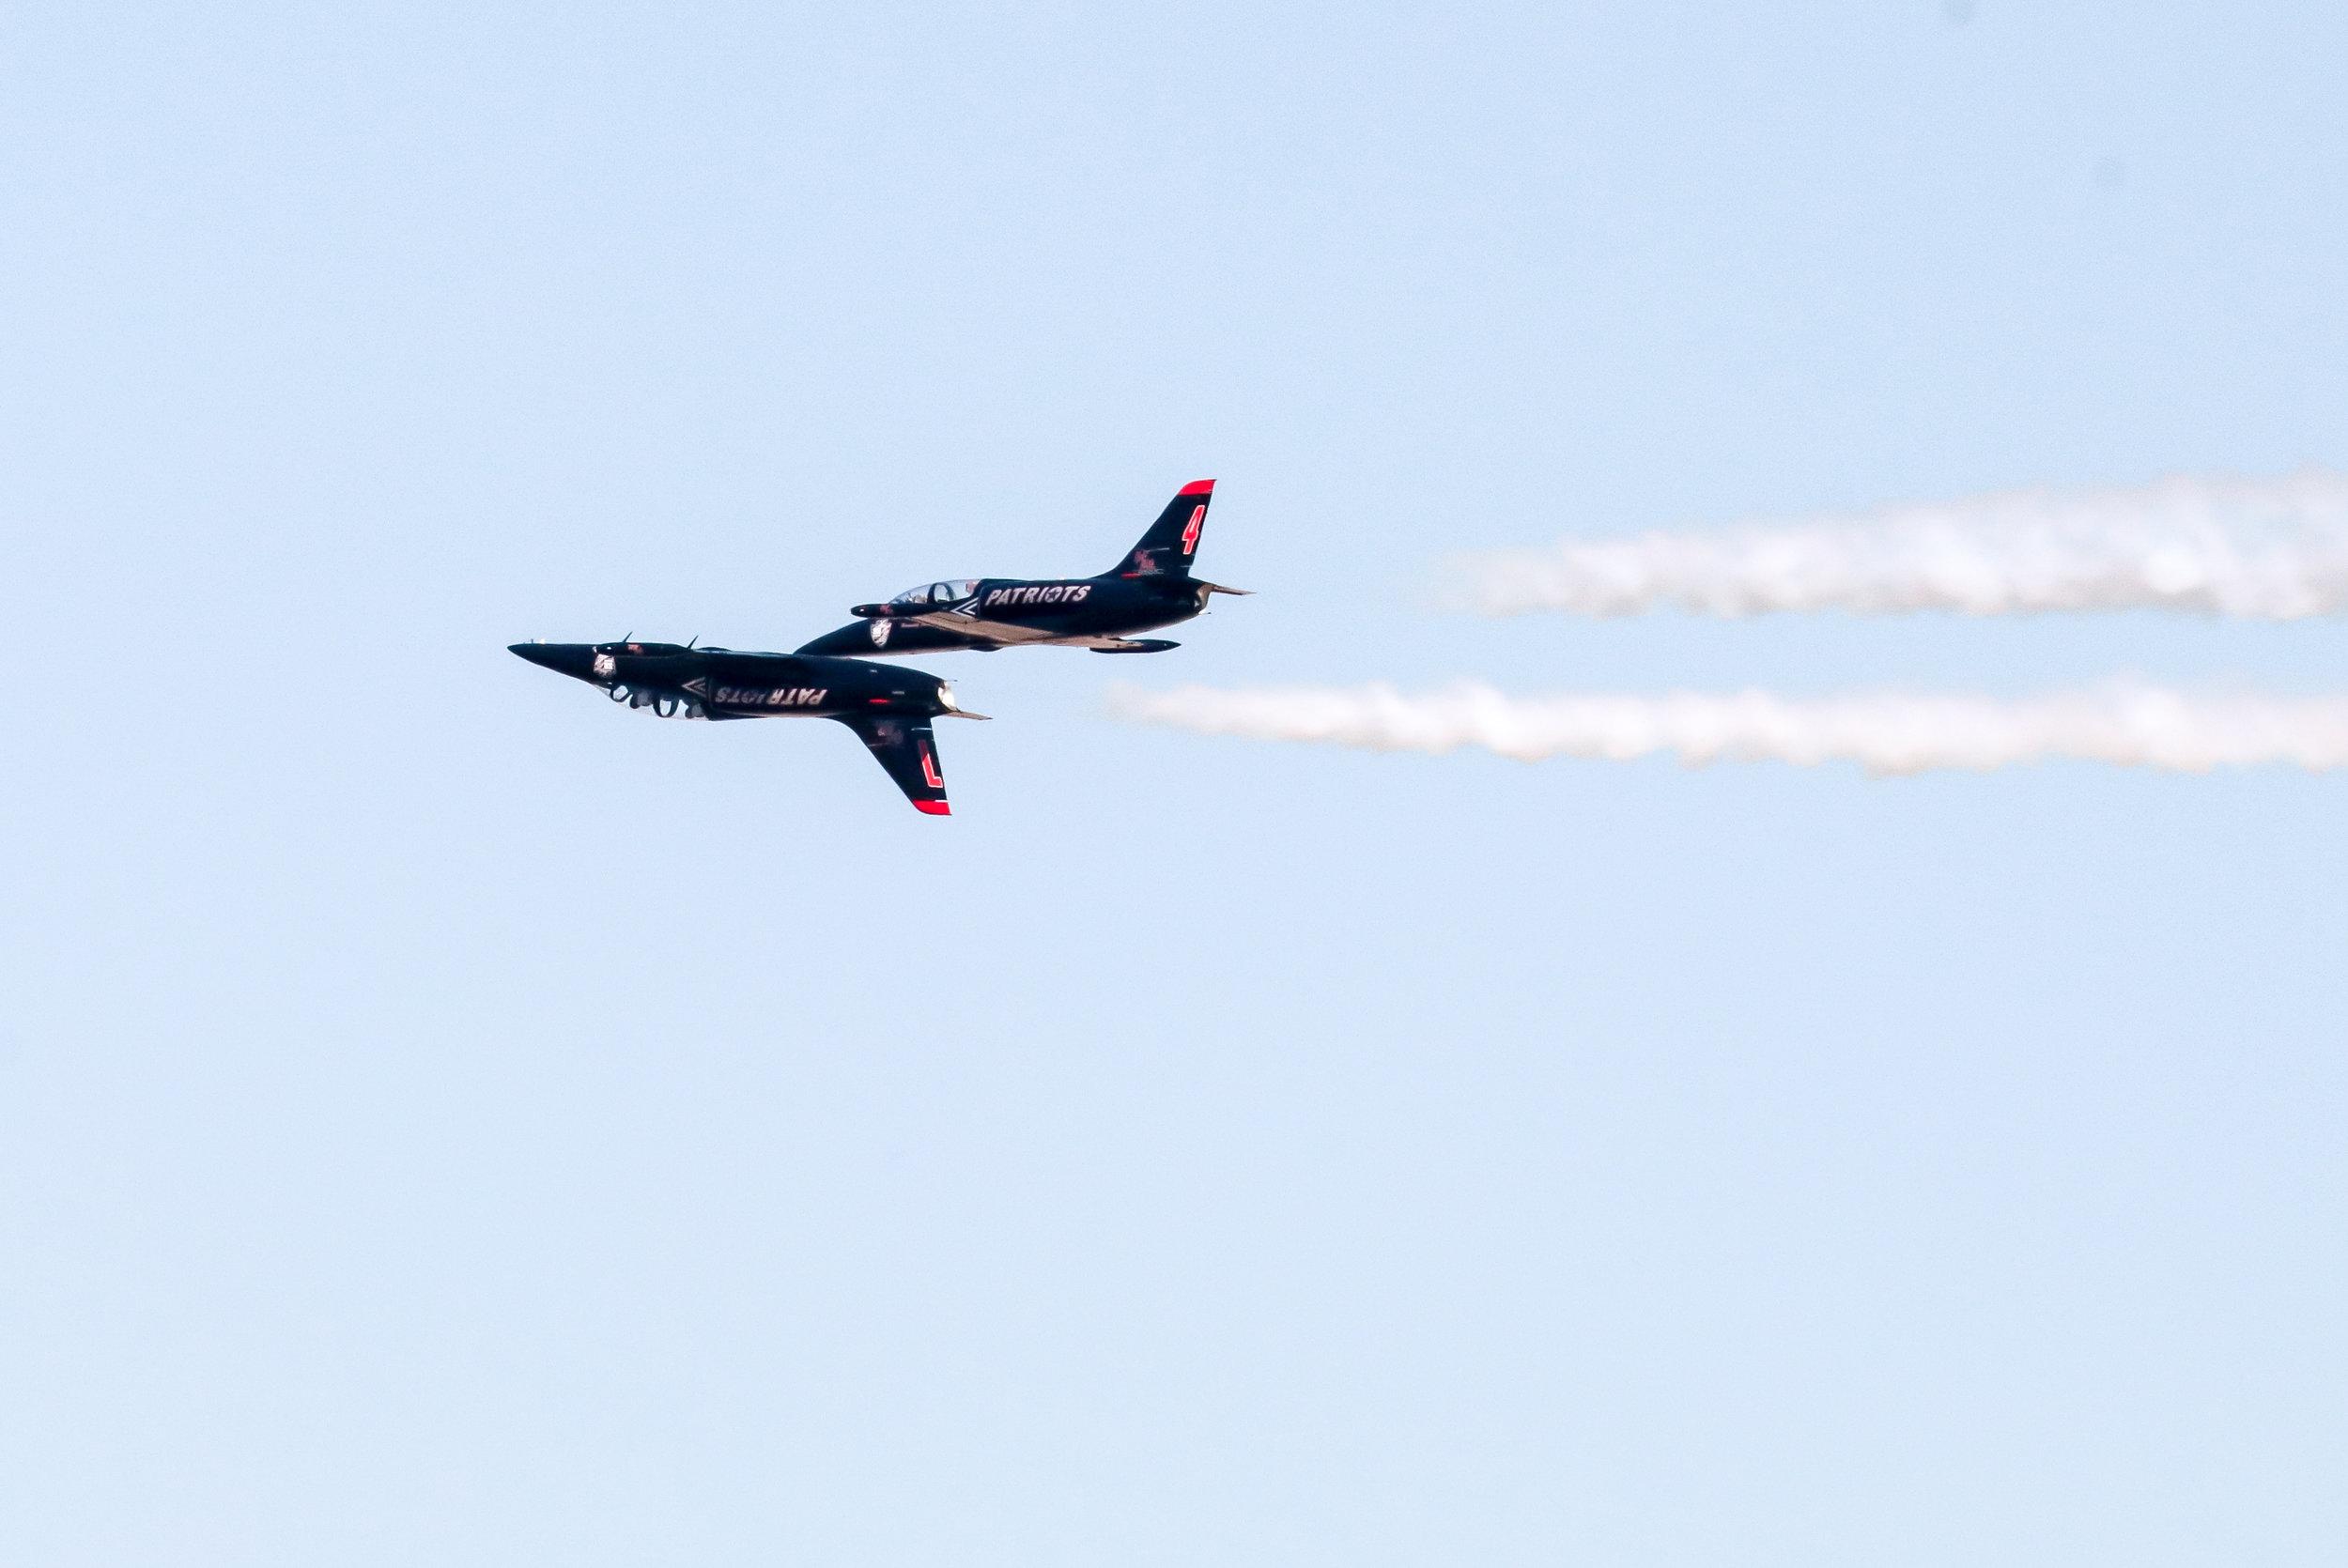 Indy16-2689.jpg